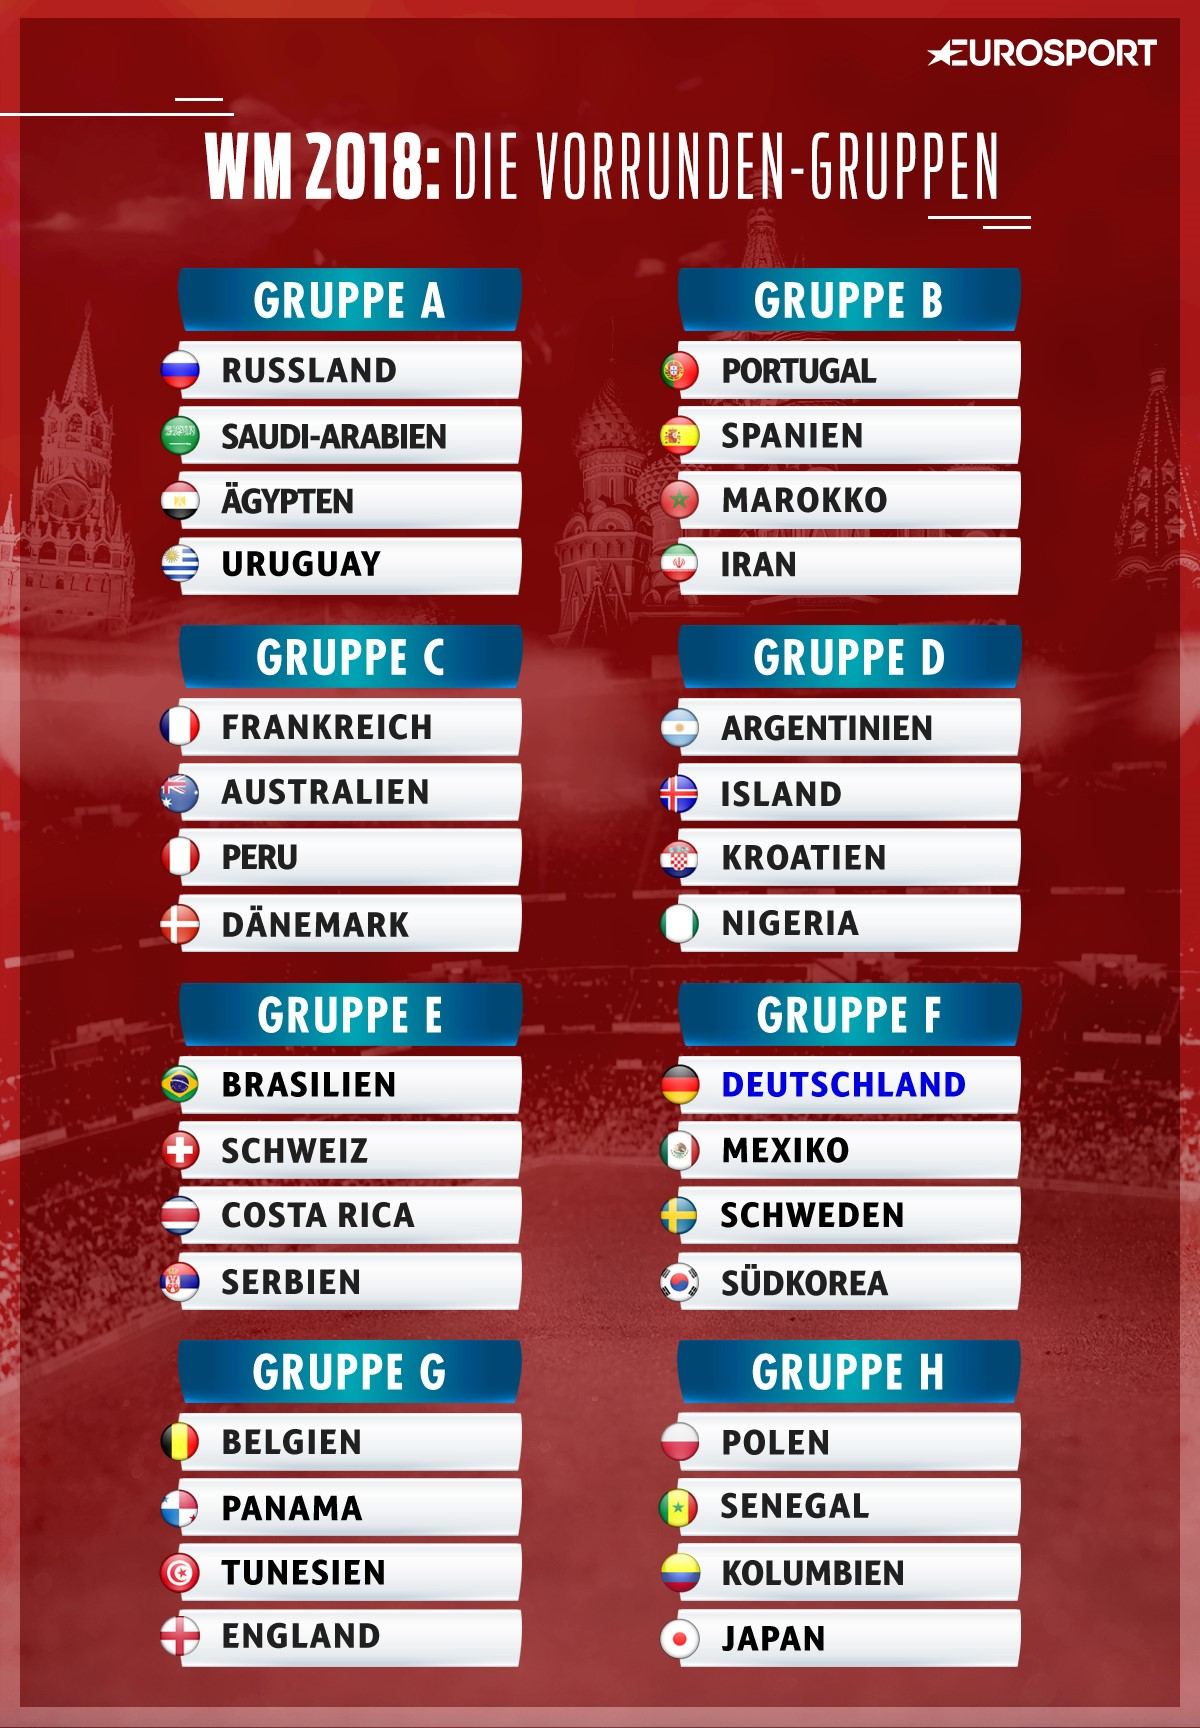 WM-Gruppen 2018 in Russland